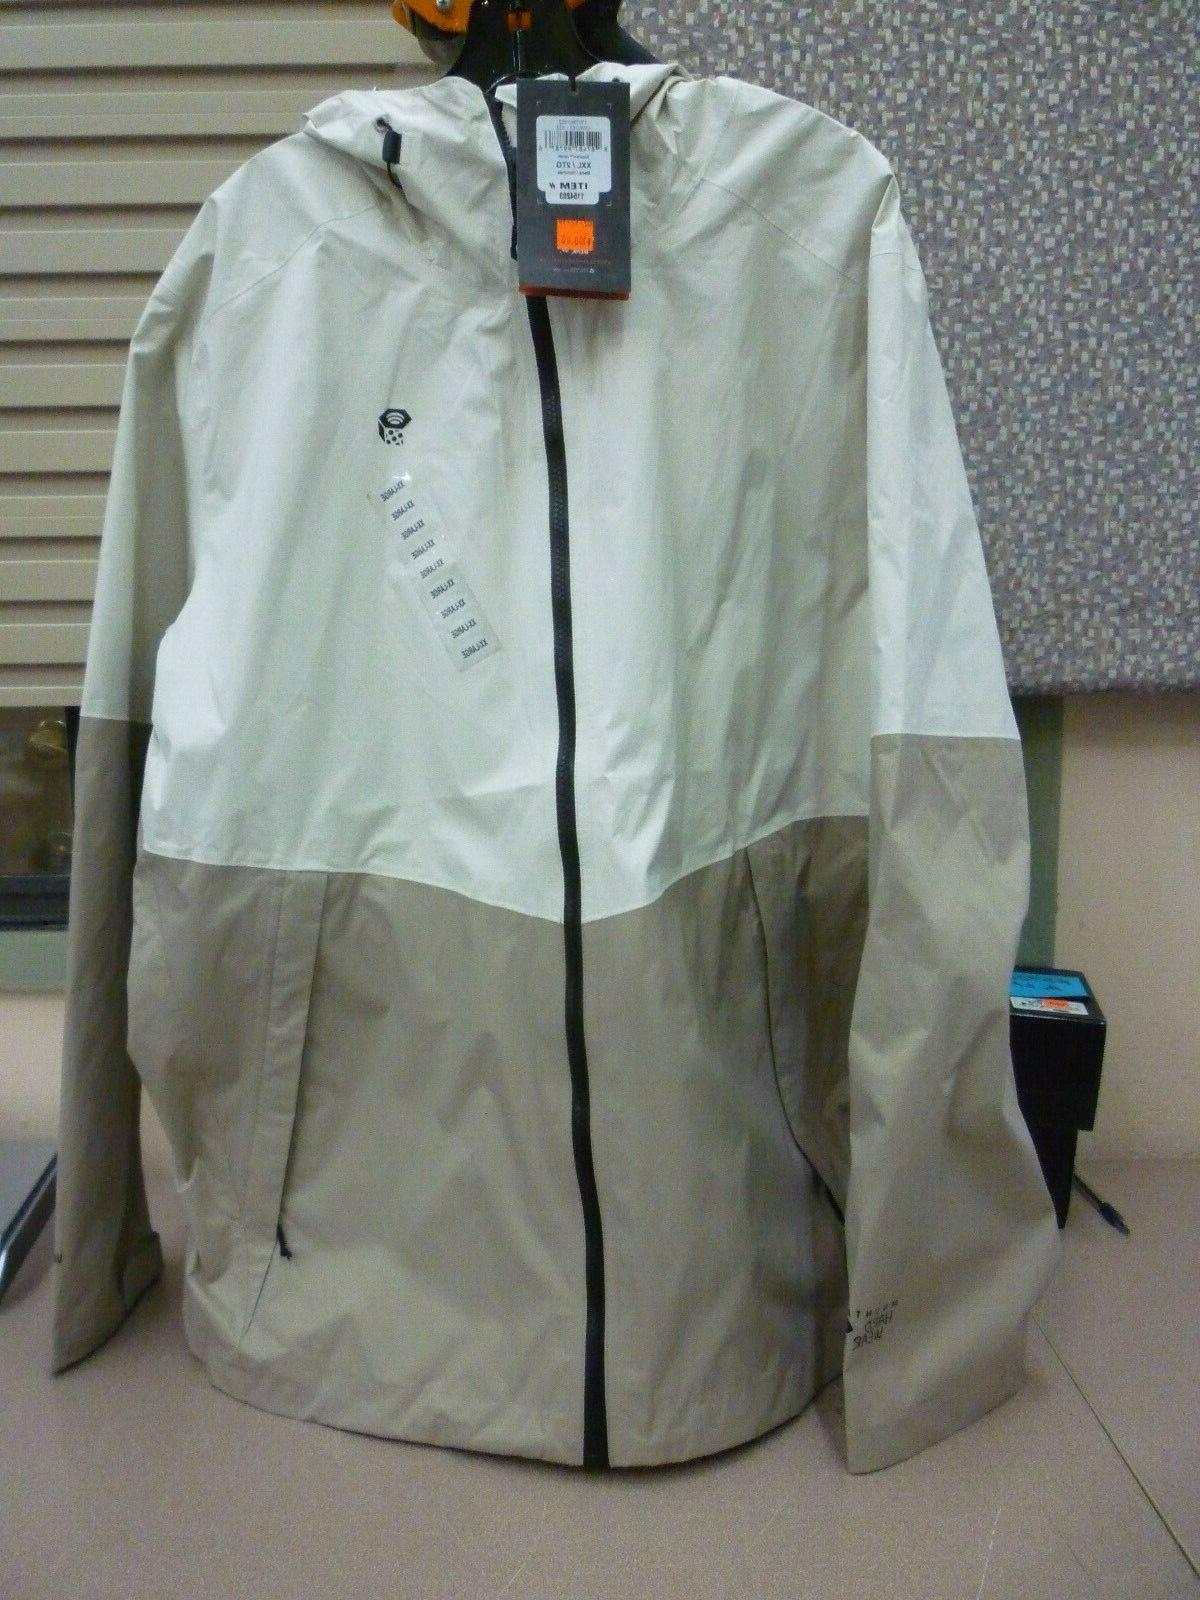 Mountain Hardwear Men's Exponent Jacket TAN COLORS, sz 2XL